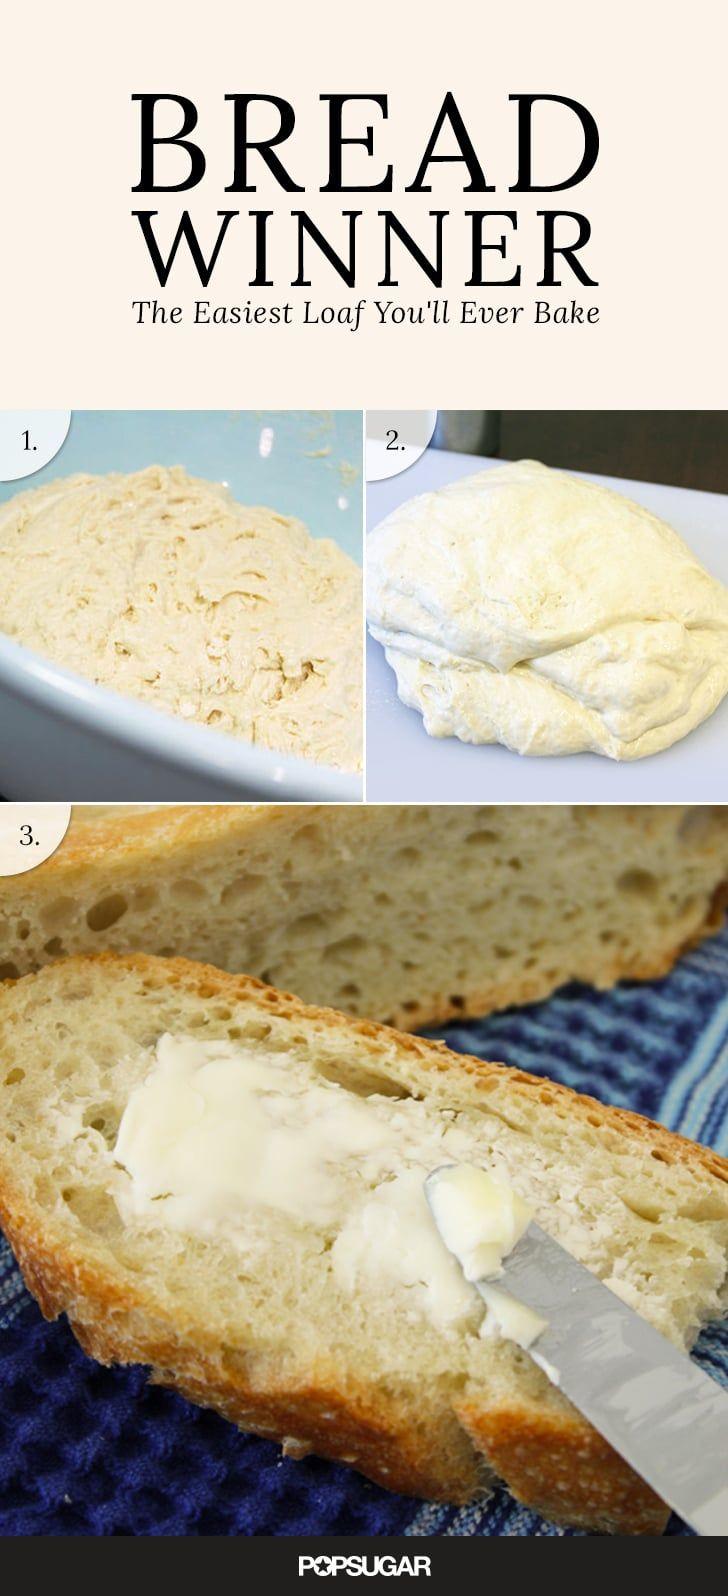 Mark Bittman's 3-Ingredient No-Knead Bread Actually Works #markbittmanrecipes